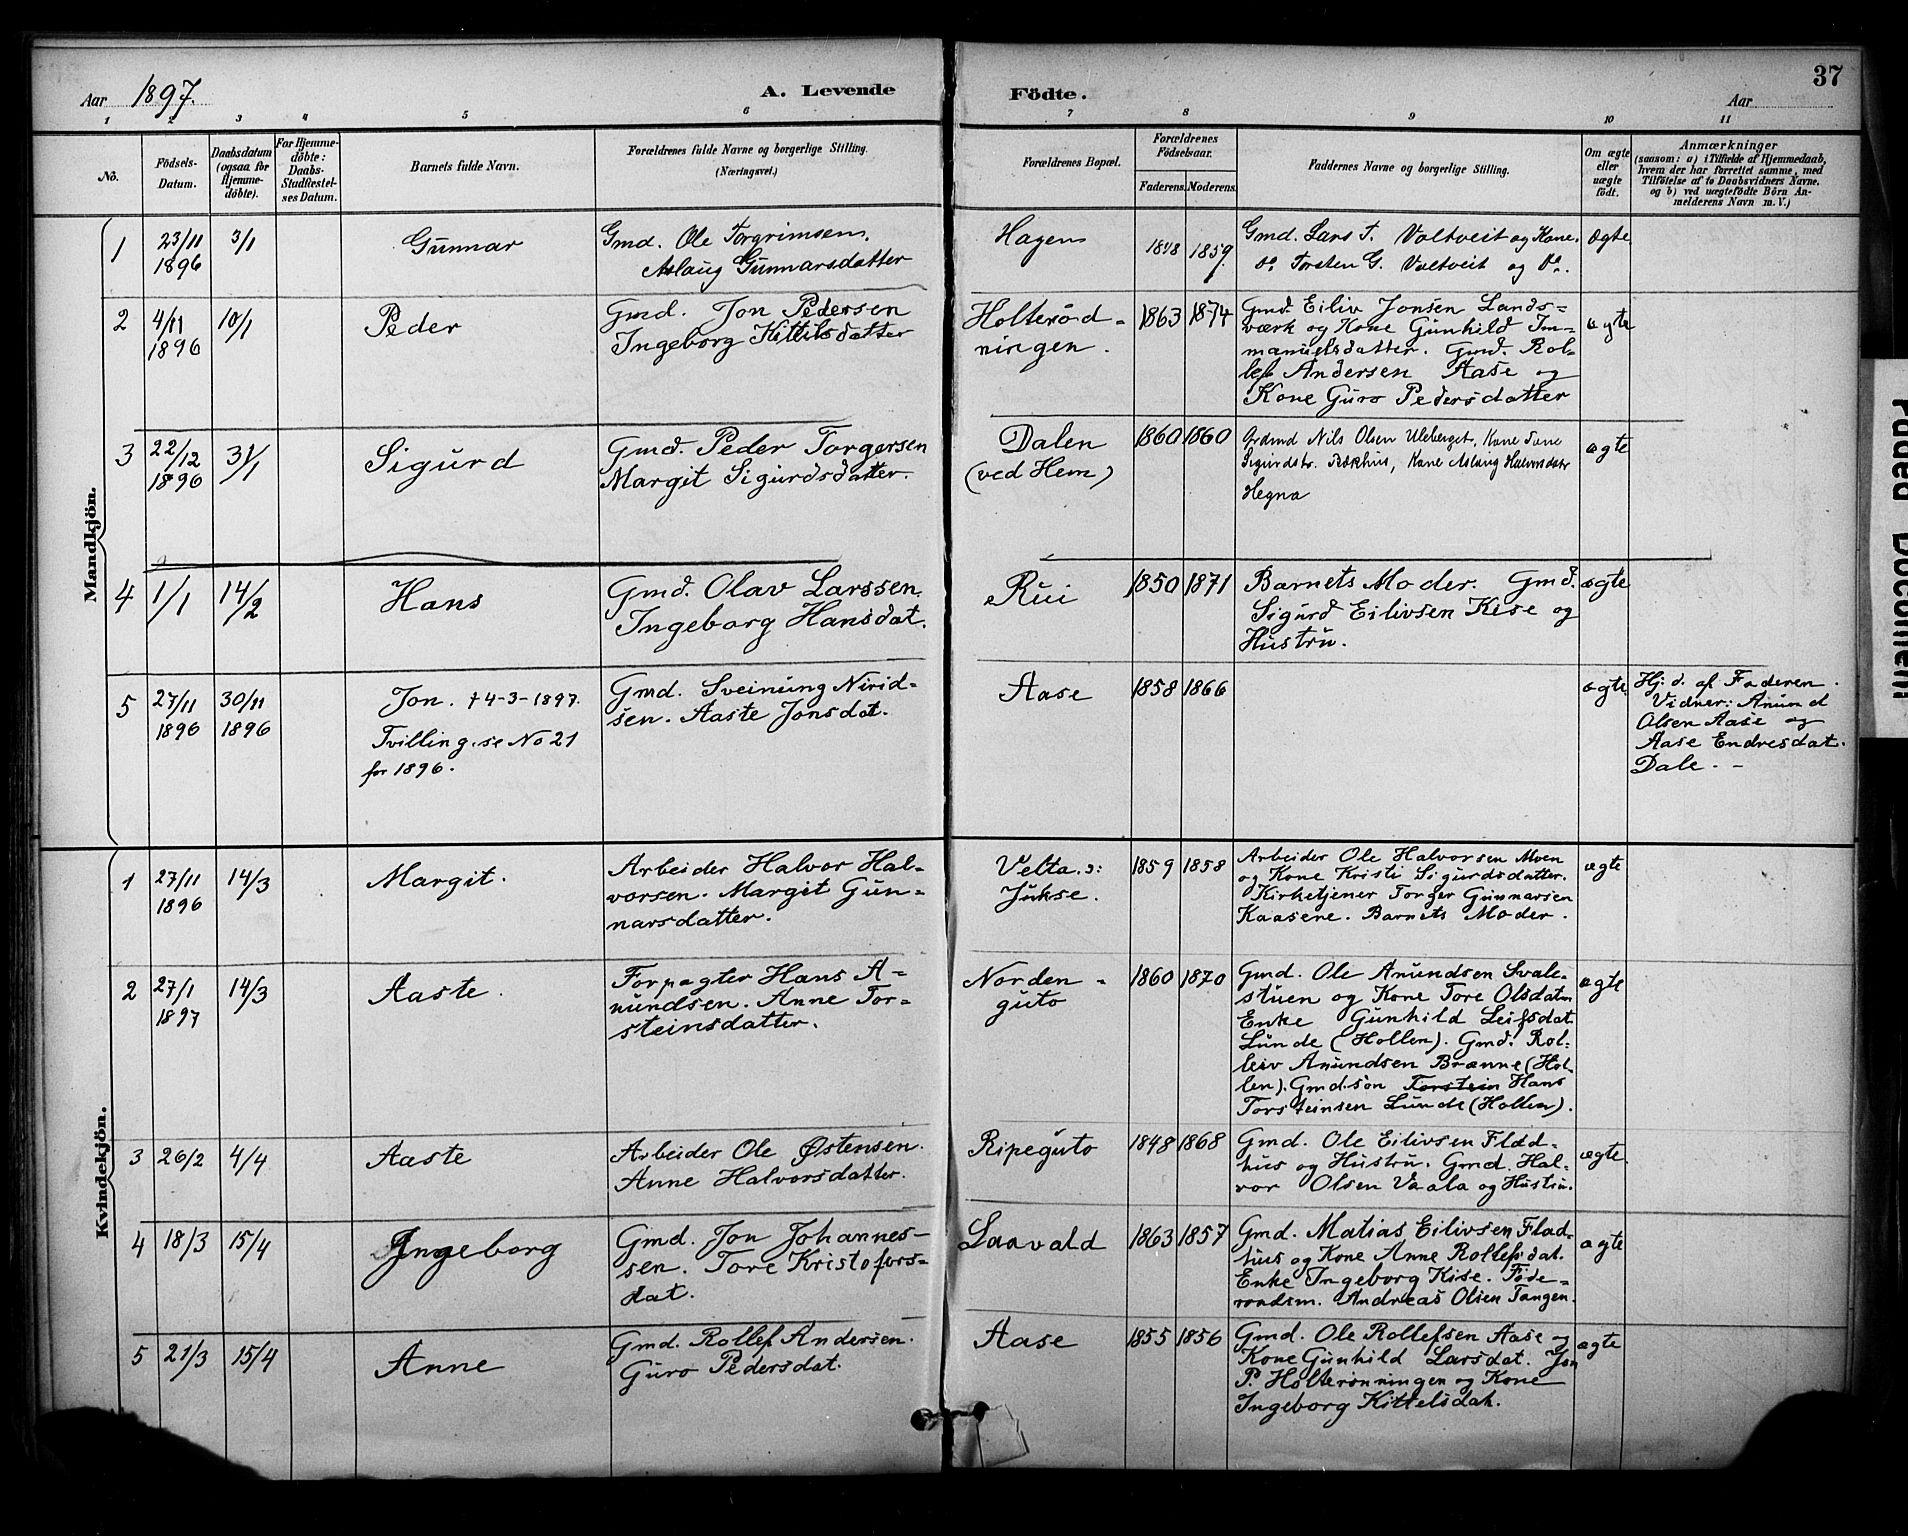 SAKO, Sauherad kirkebøker, F/Fa/L0009: Ministerialbok nr. I 9, 1887-1912, s. 37